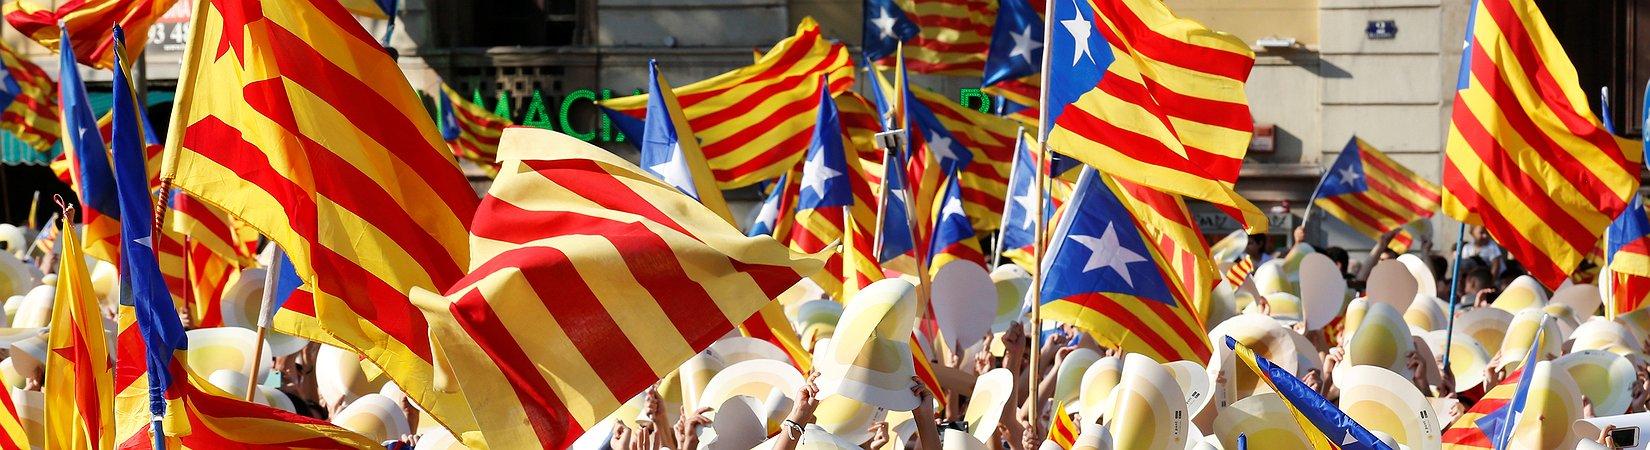 Cataluña vuelve a pedir la independencia